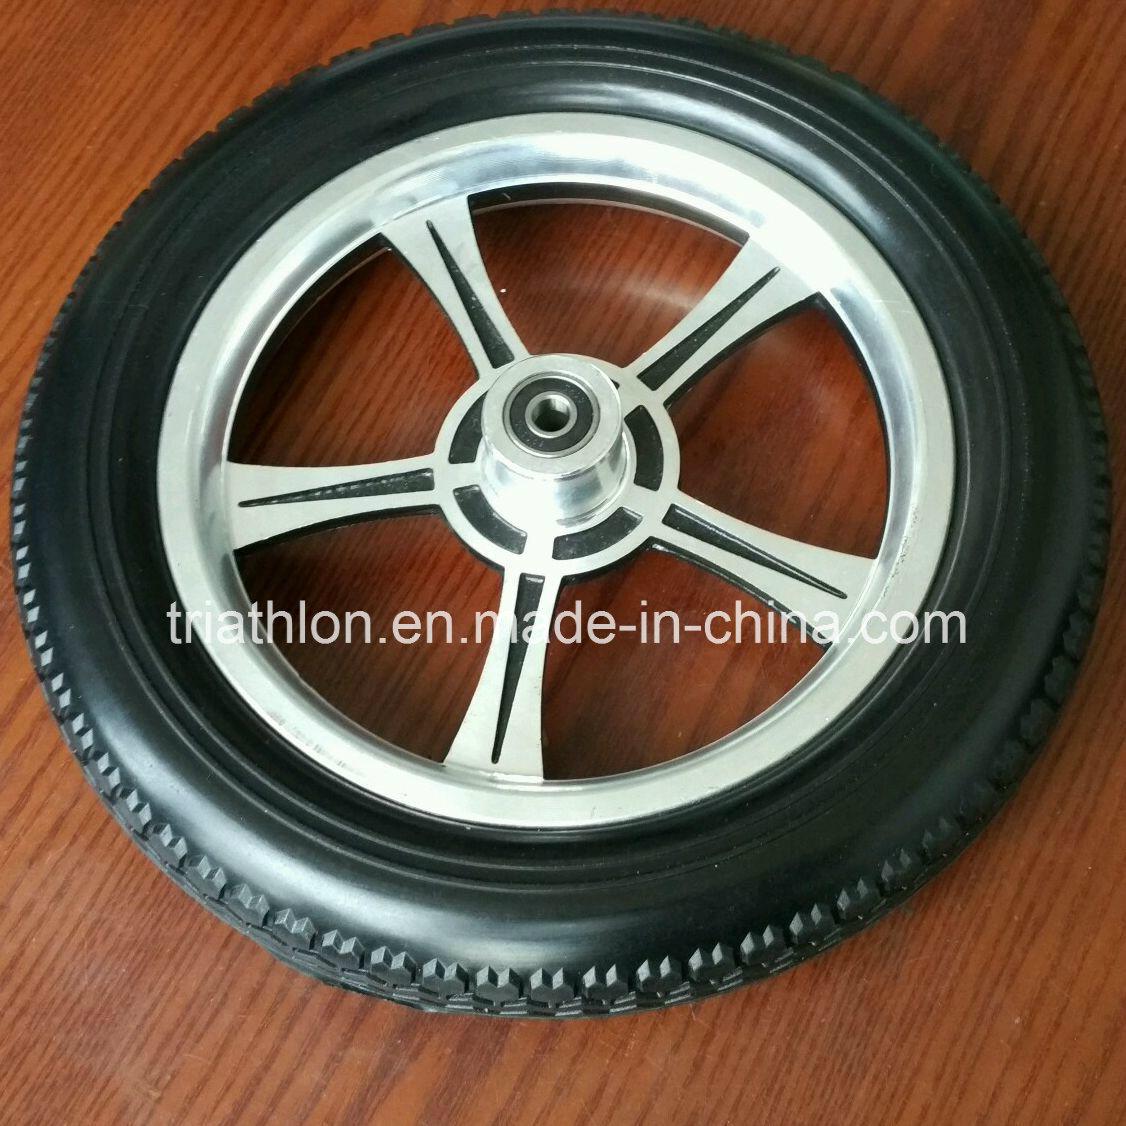 12X 1.75 12X2.125 12X2.5 12X3 Flat Free Trolley Wheel